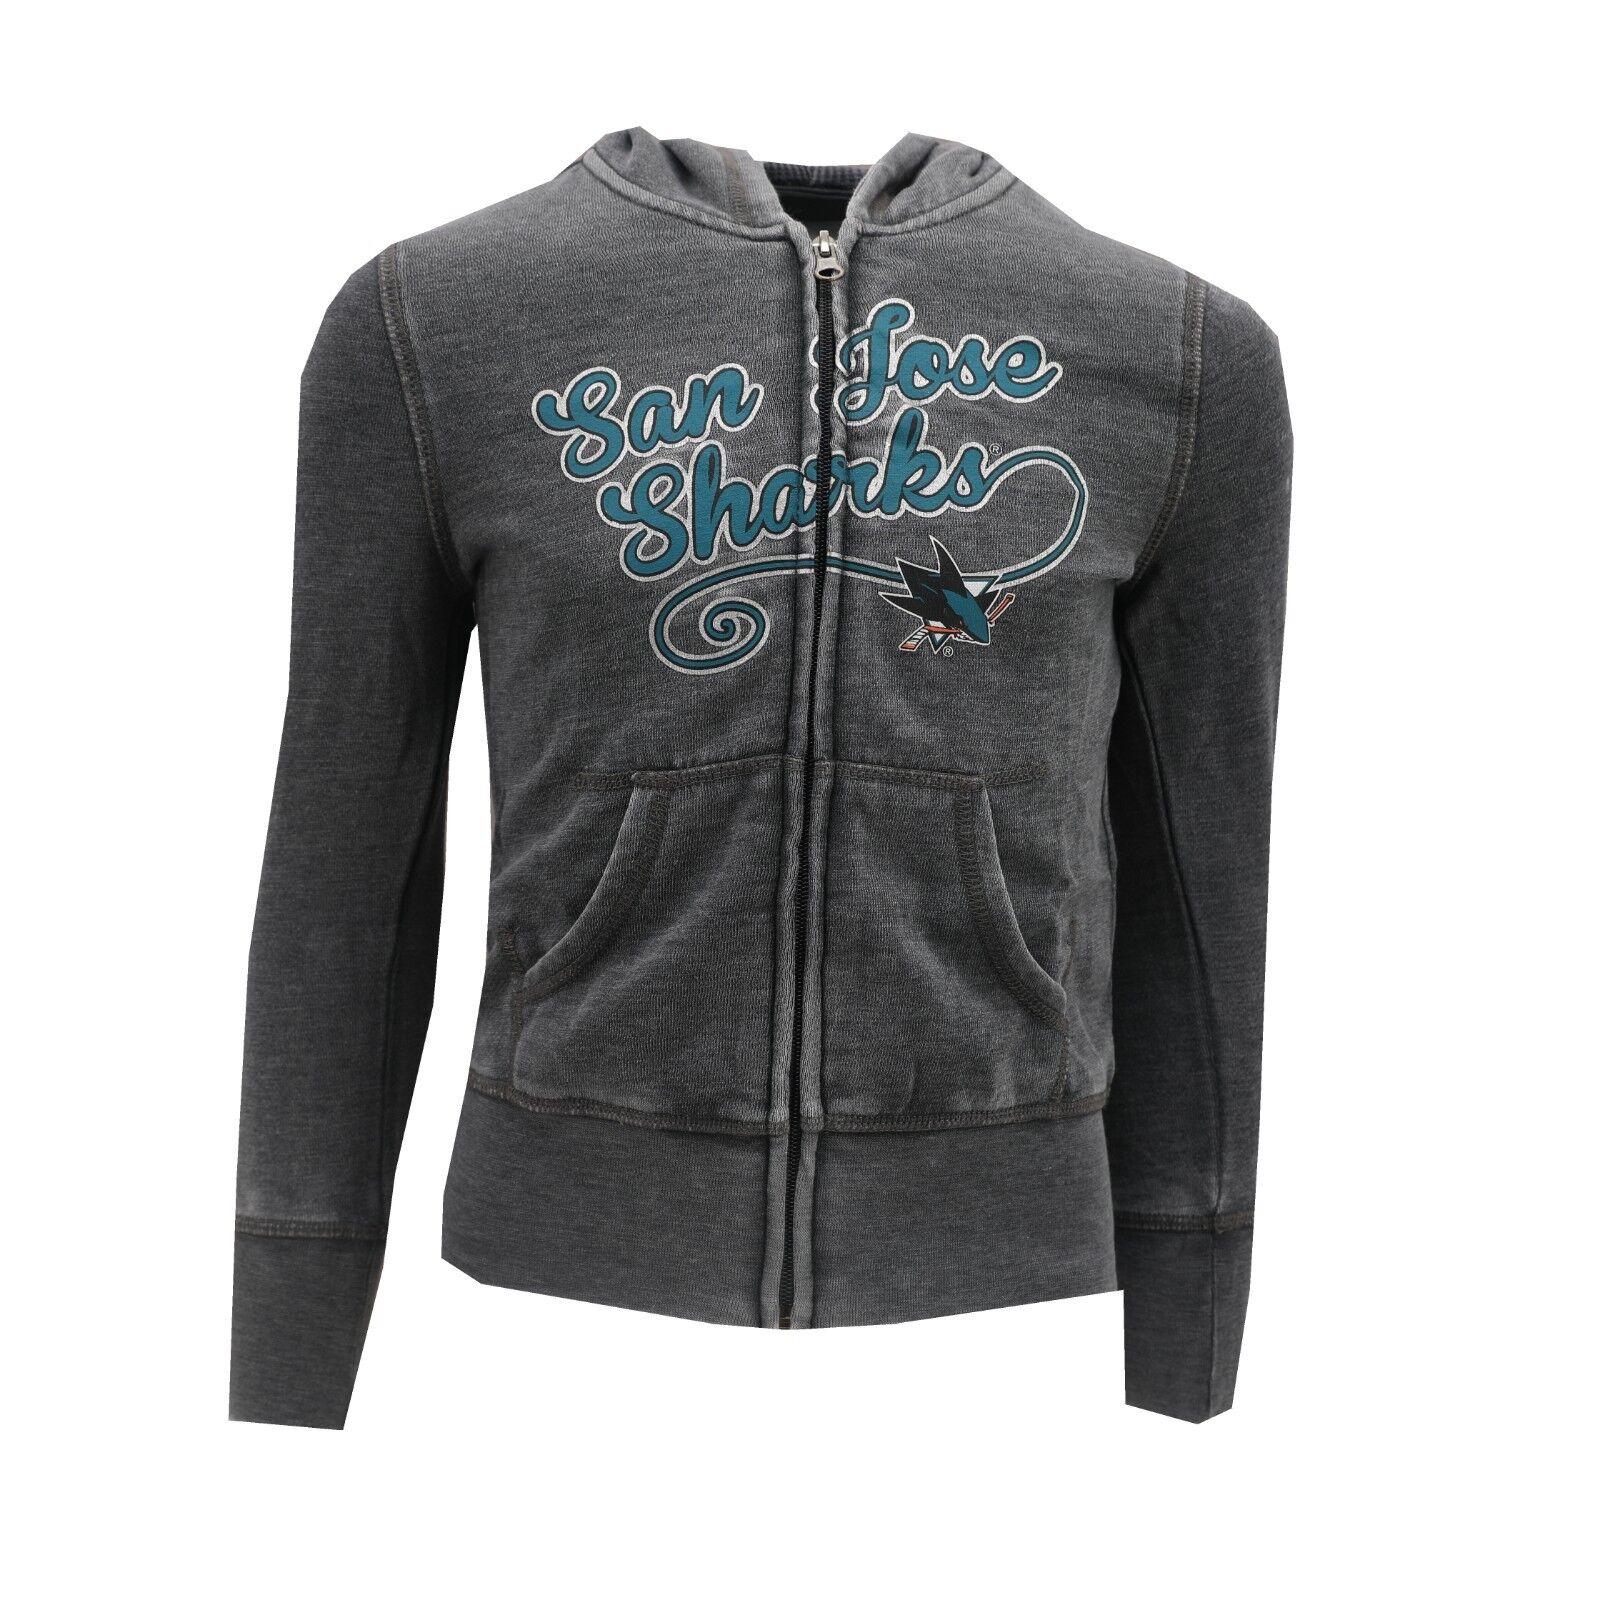 717fe9cdc San Jose Sharks NHL Kids Youth Girls Size Full Zip Hooded Sweatshirt New  Tags